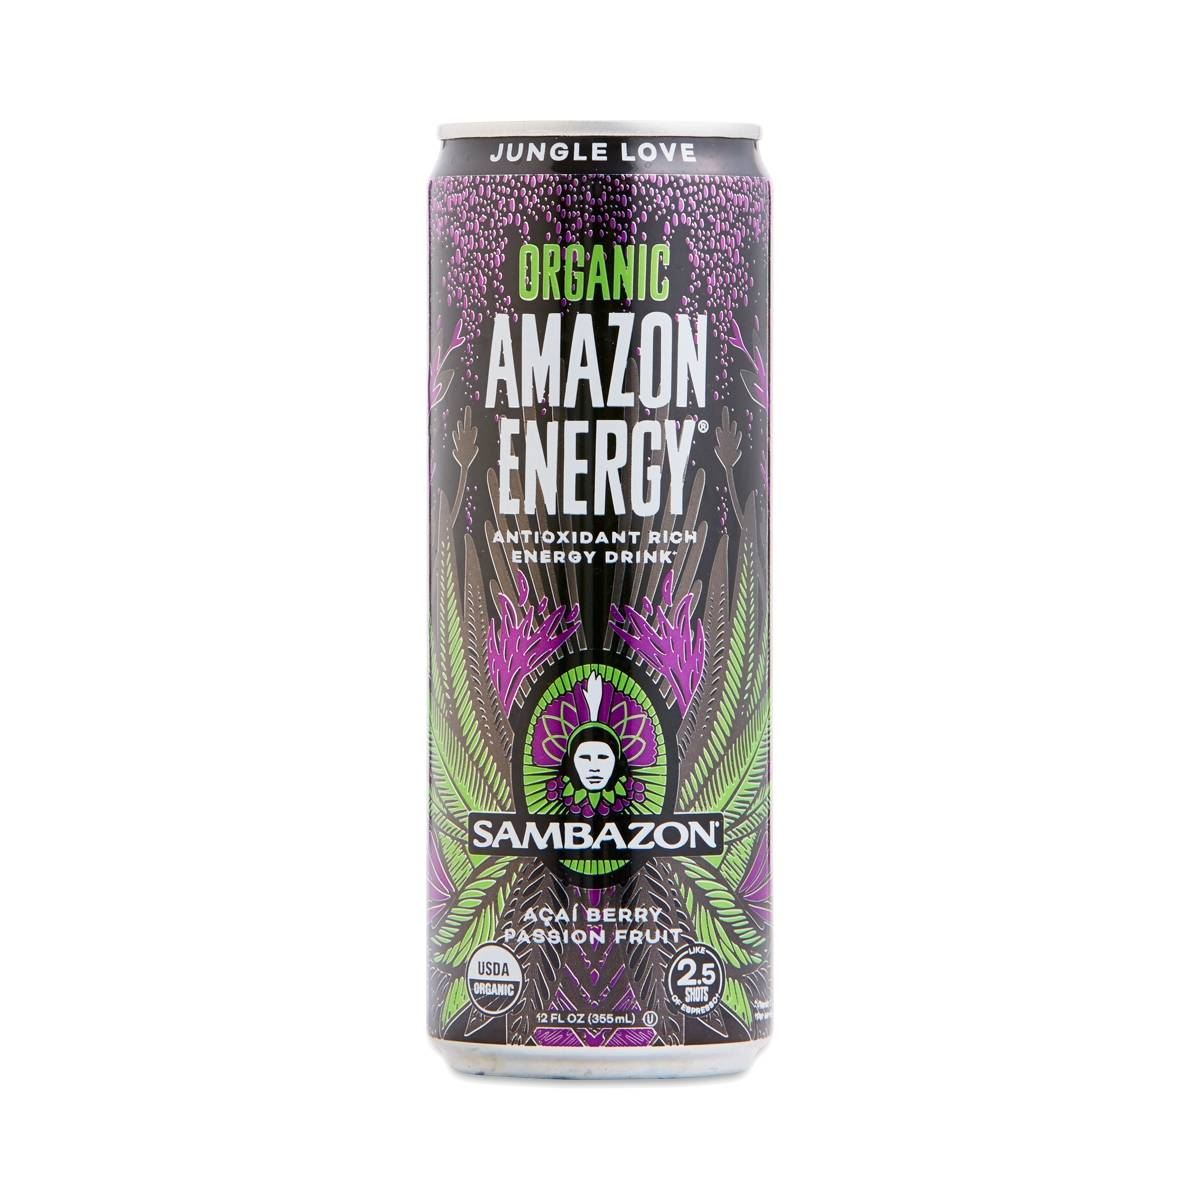 Sambazon Jungle Love Amazon Energy Drink Acai Berry Passion Fruit Thrive Market